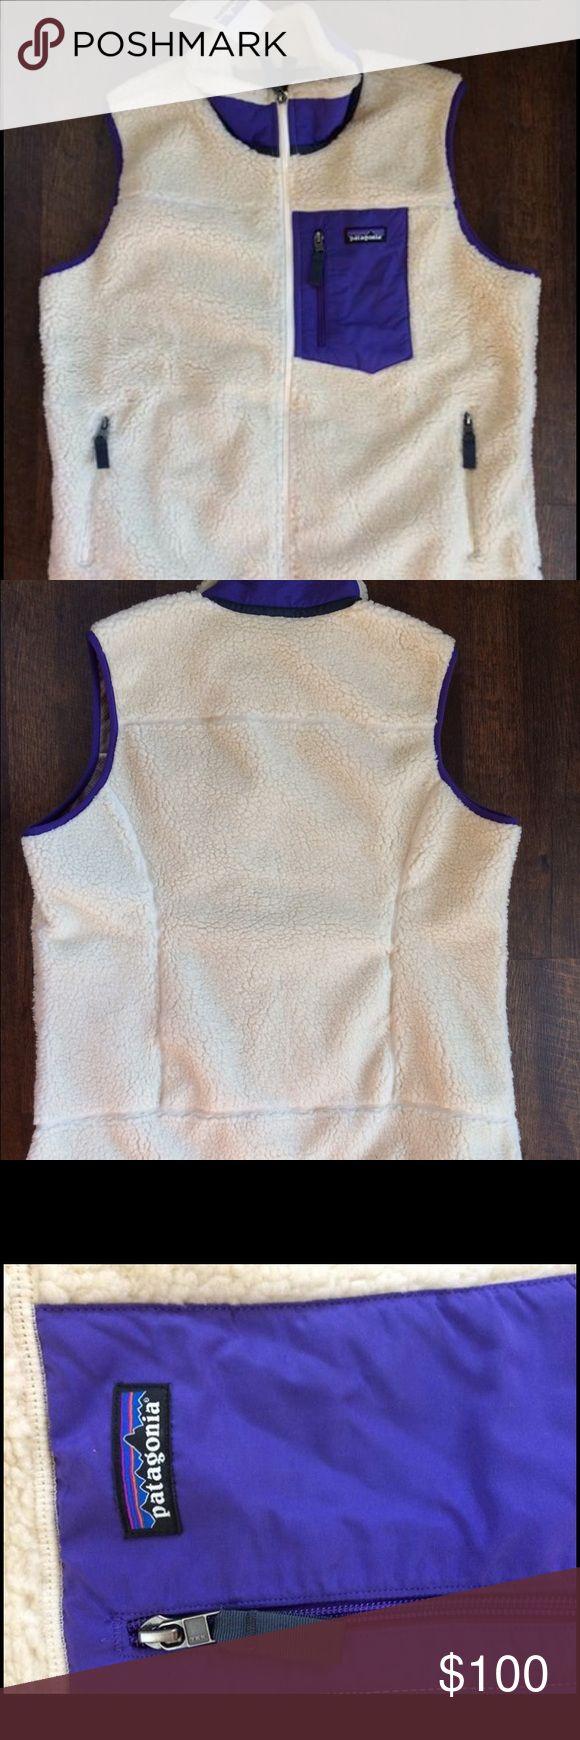 Sale!! Patagonia Retro X Vest! Women's Retro x Patagonia vest! size XL. New with tags! Super super warm!! Patagonia Jackets & Coats Vests